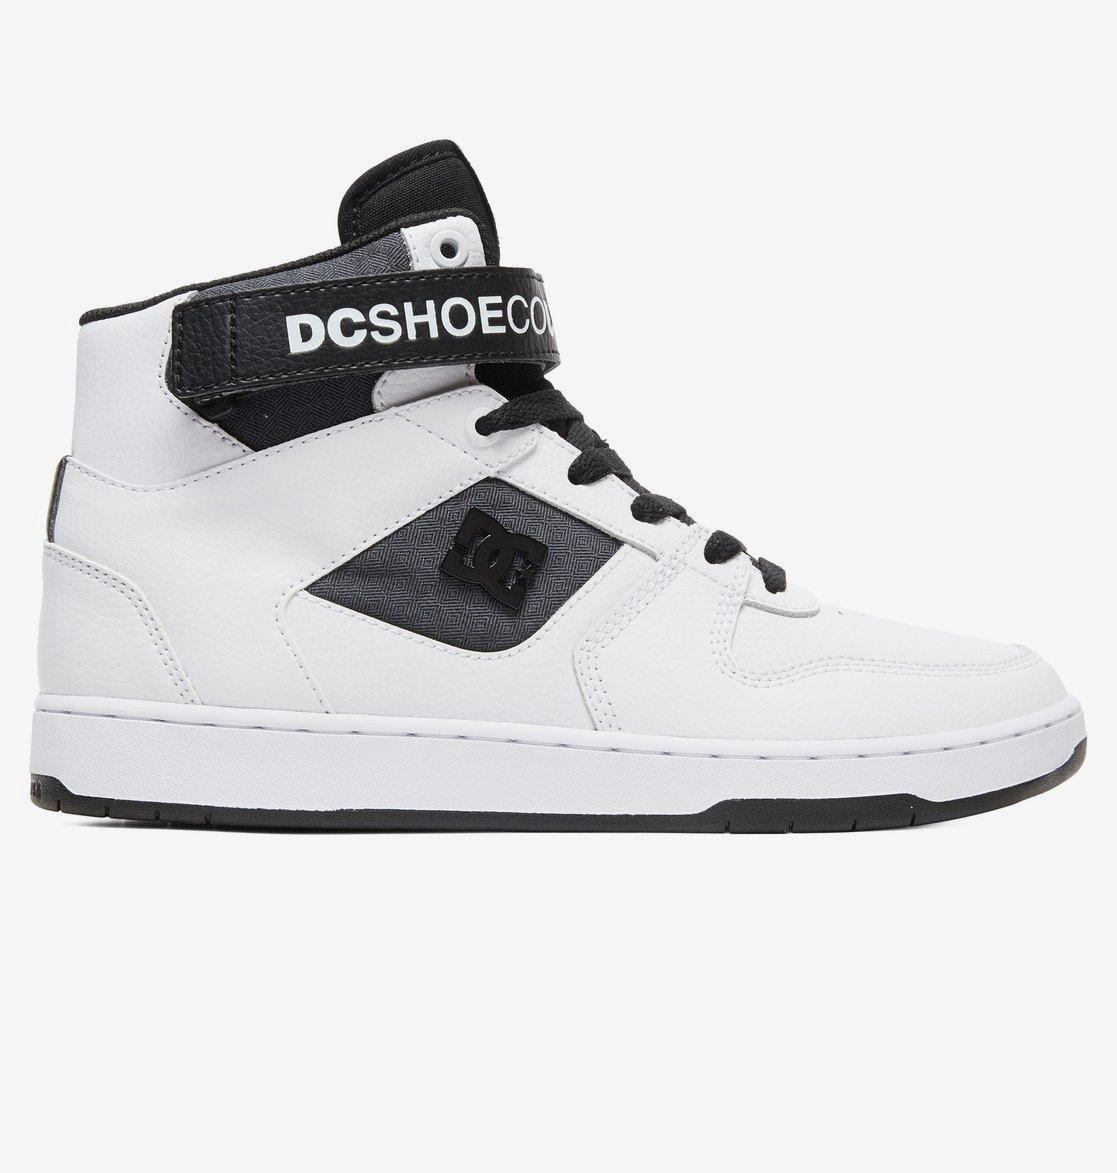 best sneakers adad7 15d42 Pensford SE - Schuhe für Männer